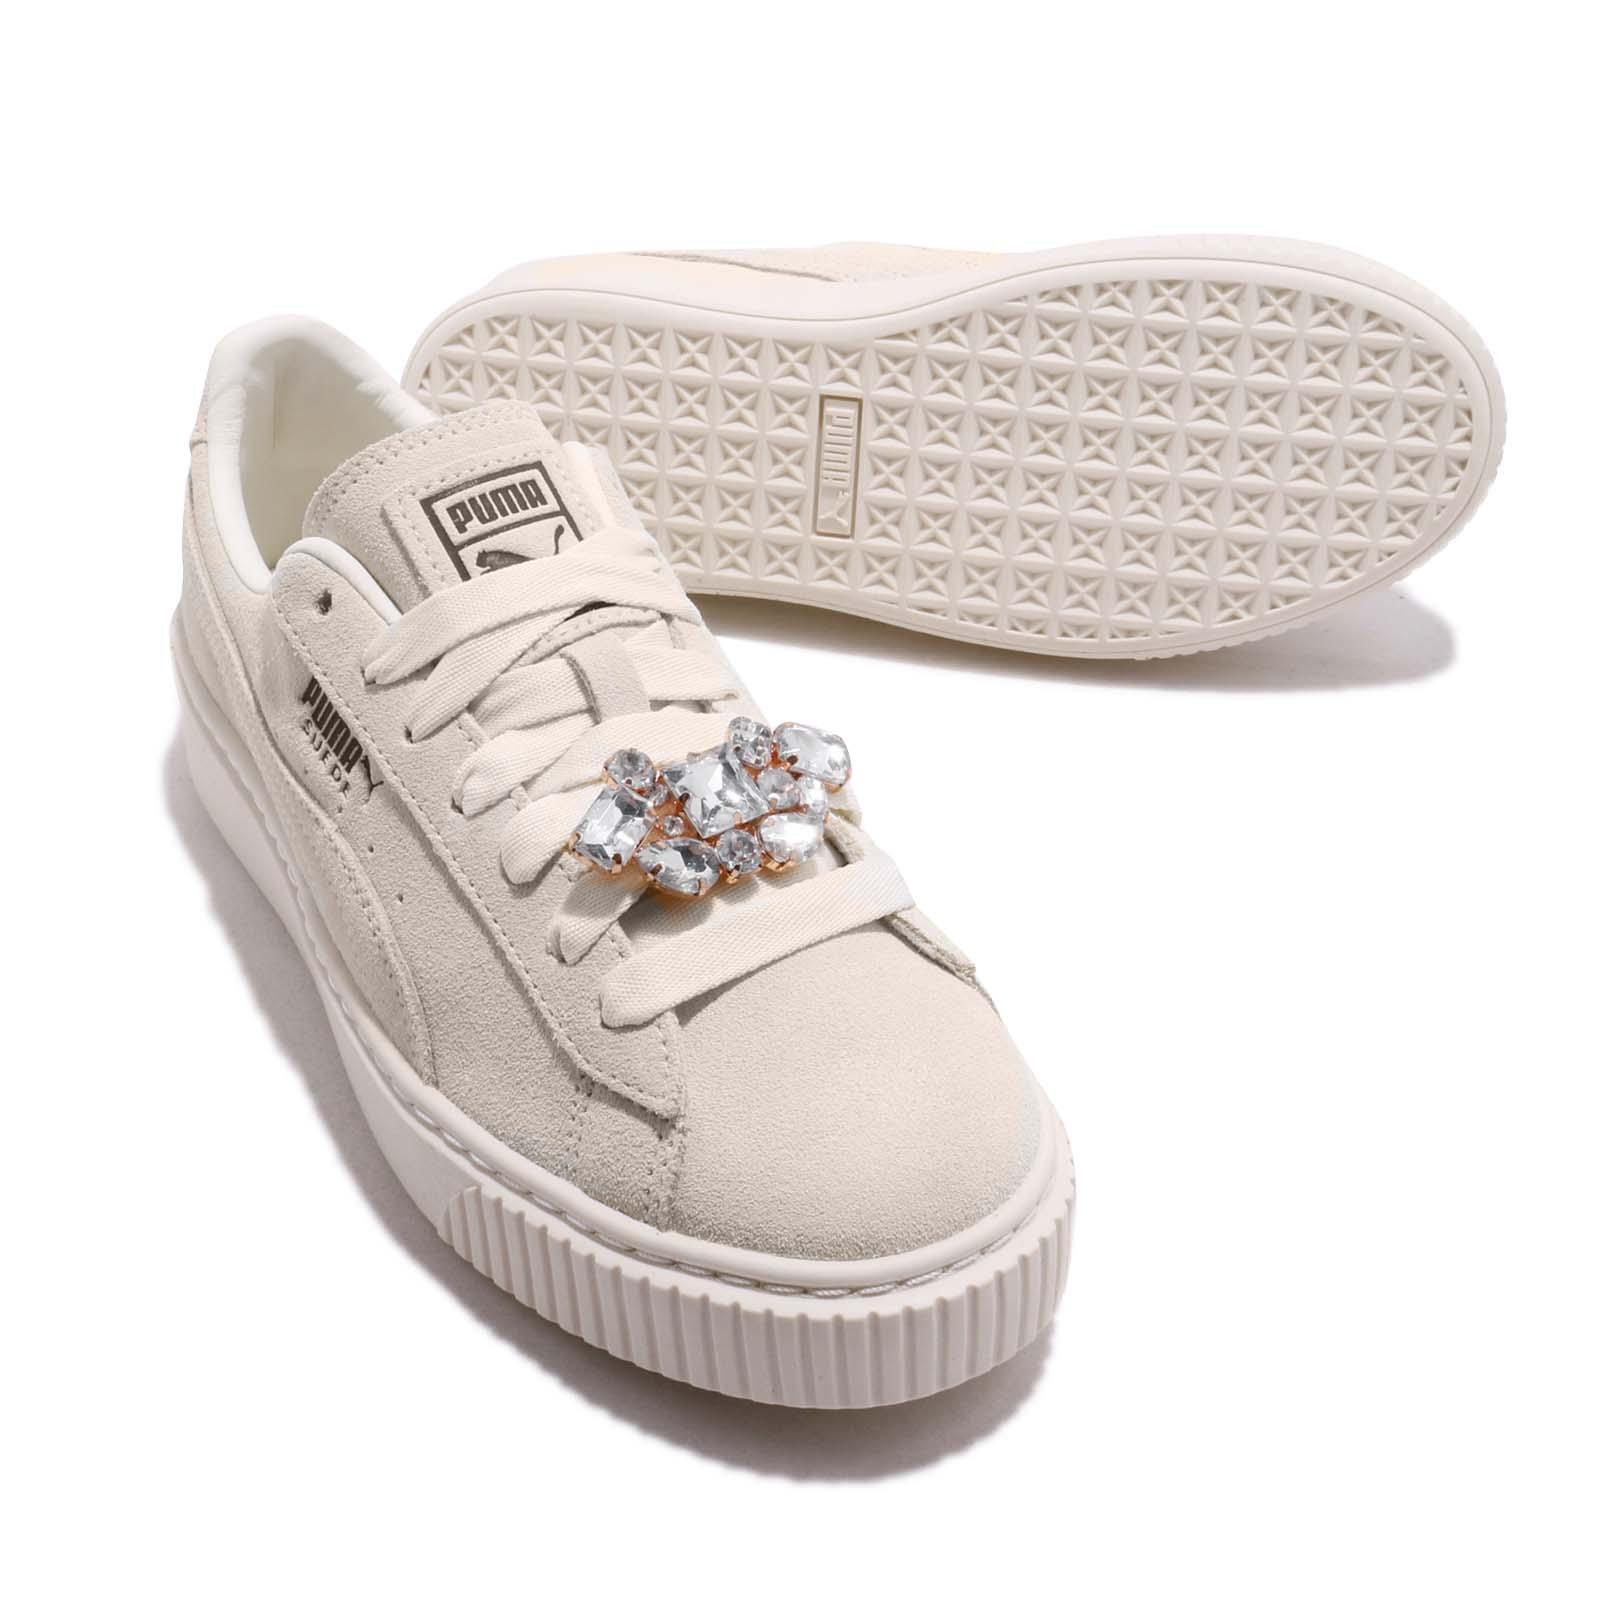 Puma Suede Platform Gem Wns Ivory Womens Lifestyle Casual Shoes ... f08a13fdb